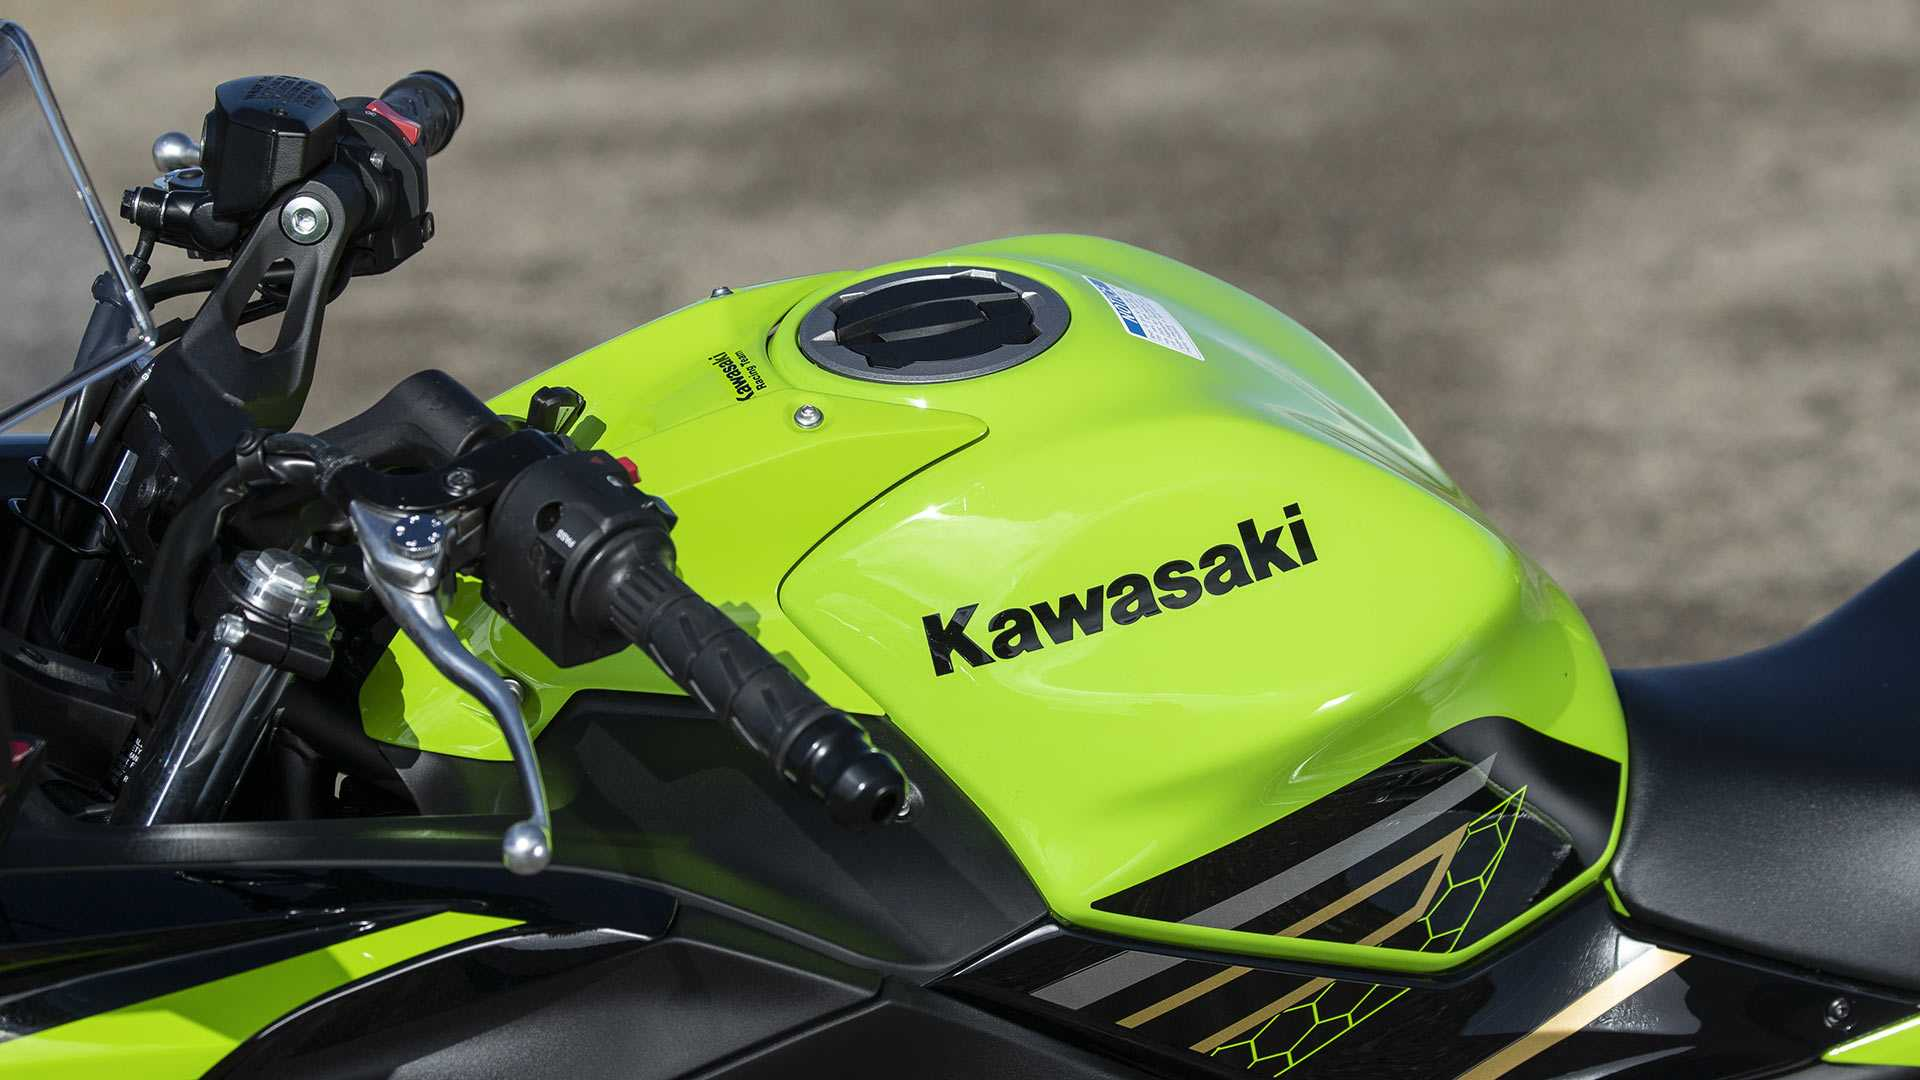 Tangki Kawasaki Ninja 650 ABS KRT Edition 2020